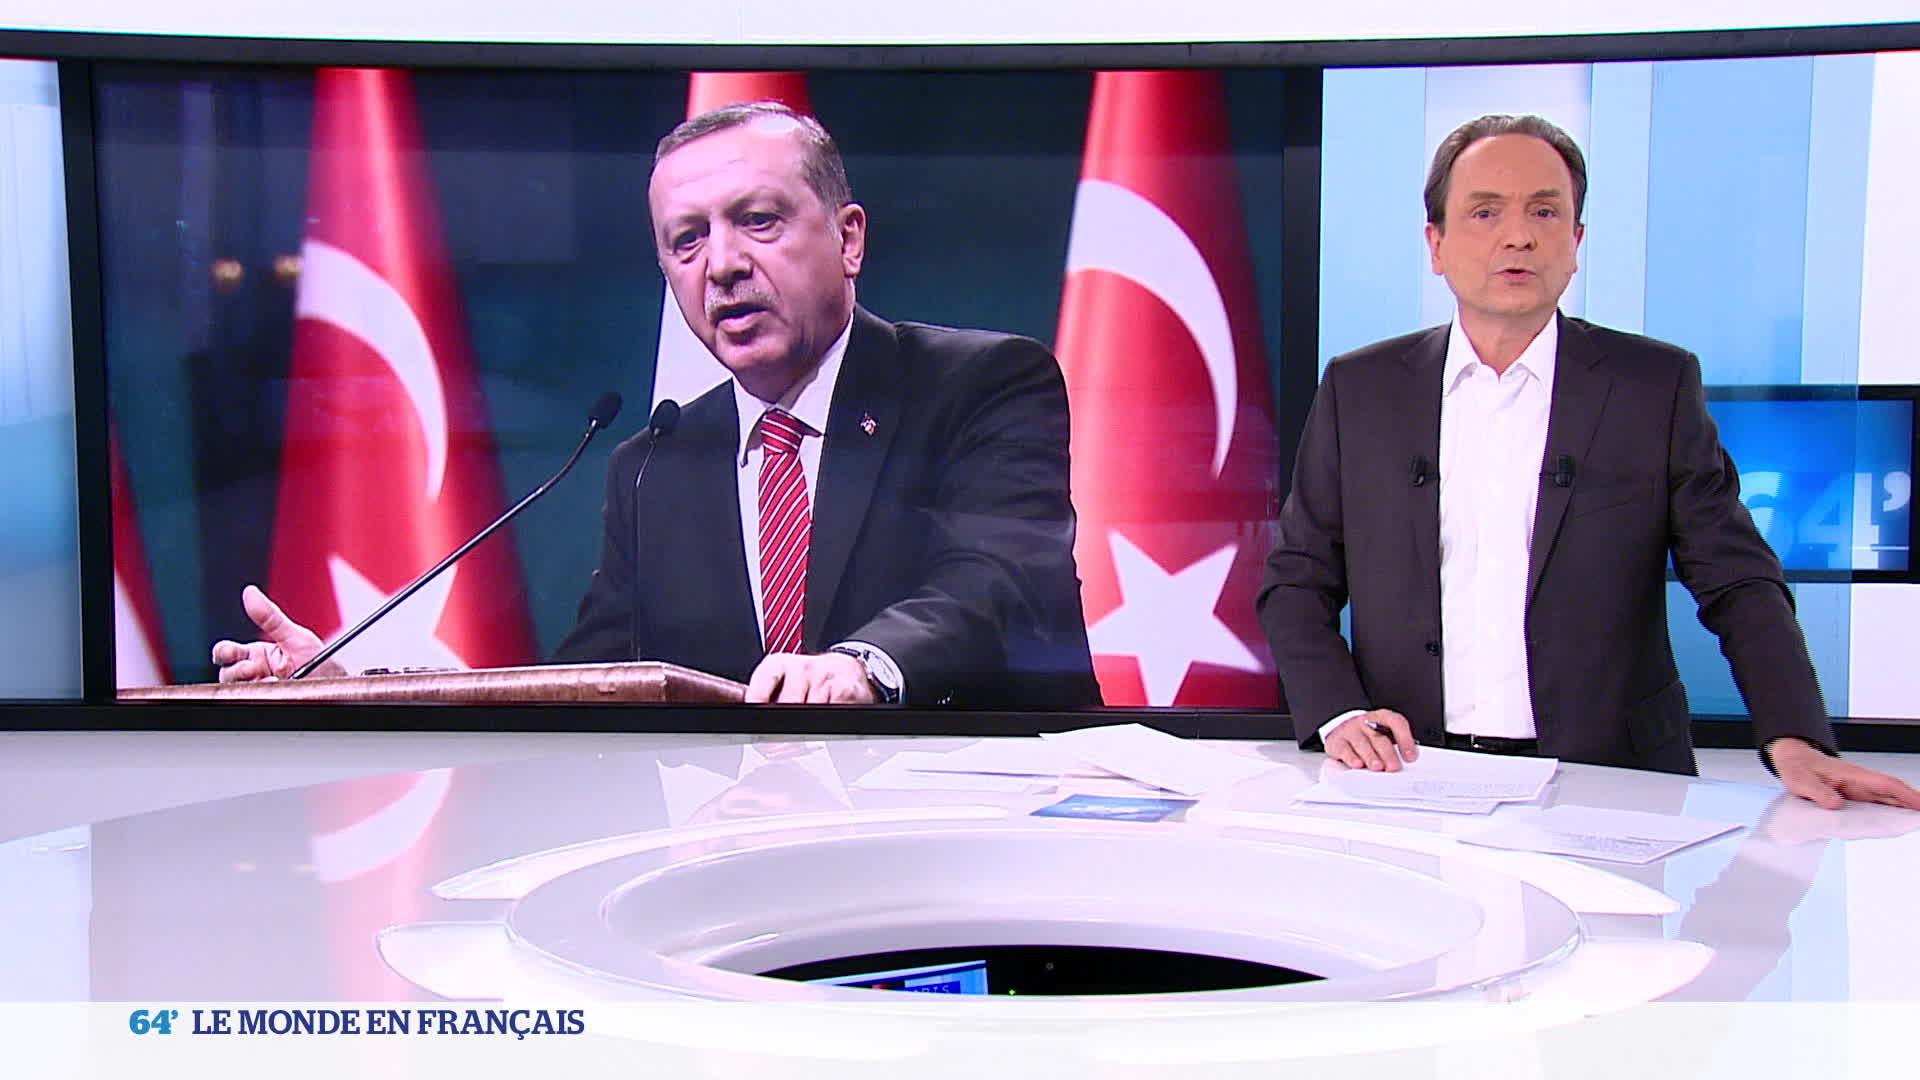 Turquie : le grand nettoyage continue